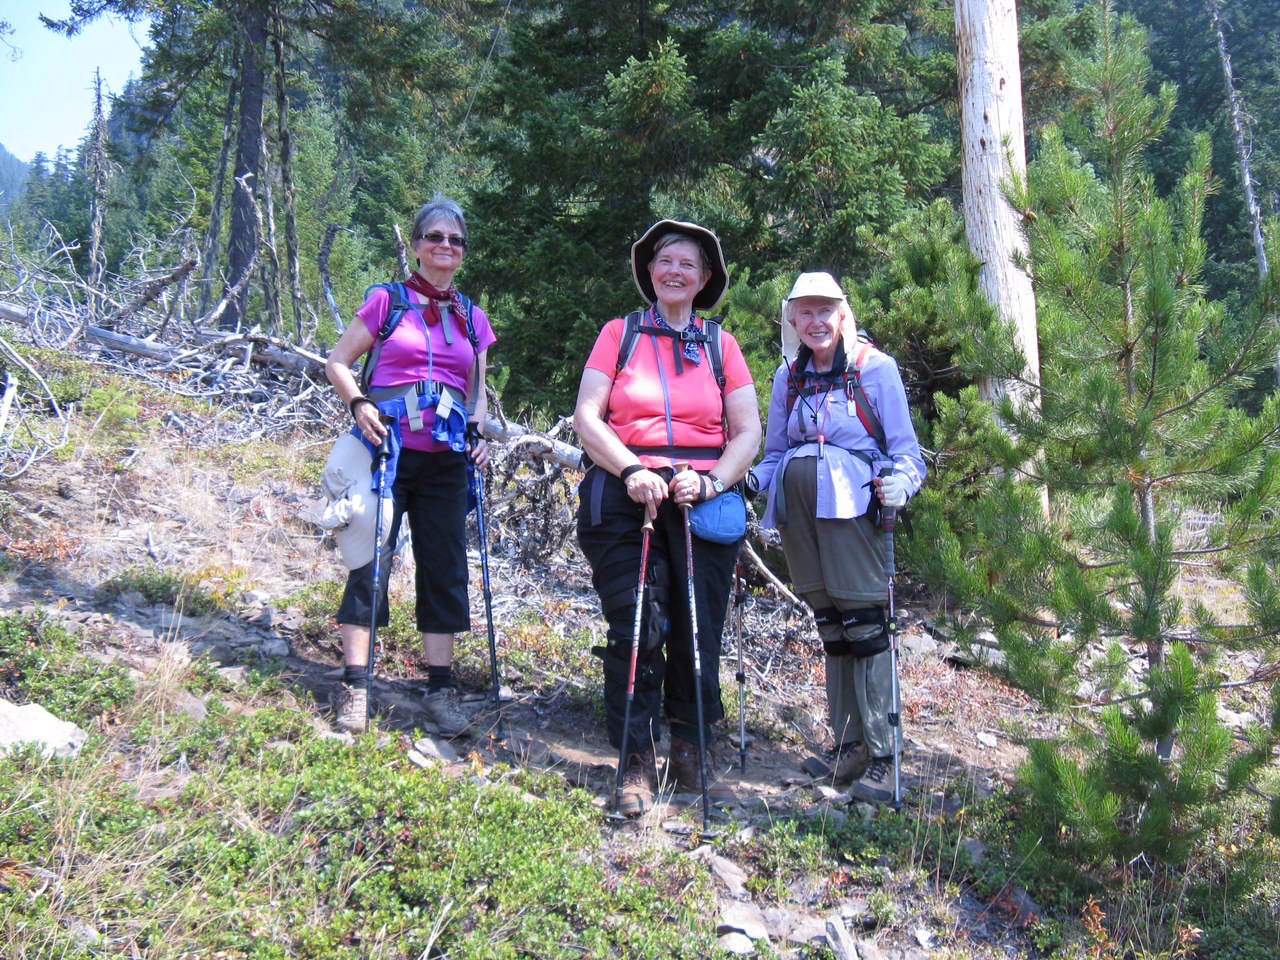 Dianne, Mary Beth & Helen